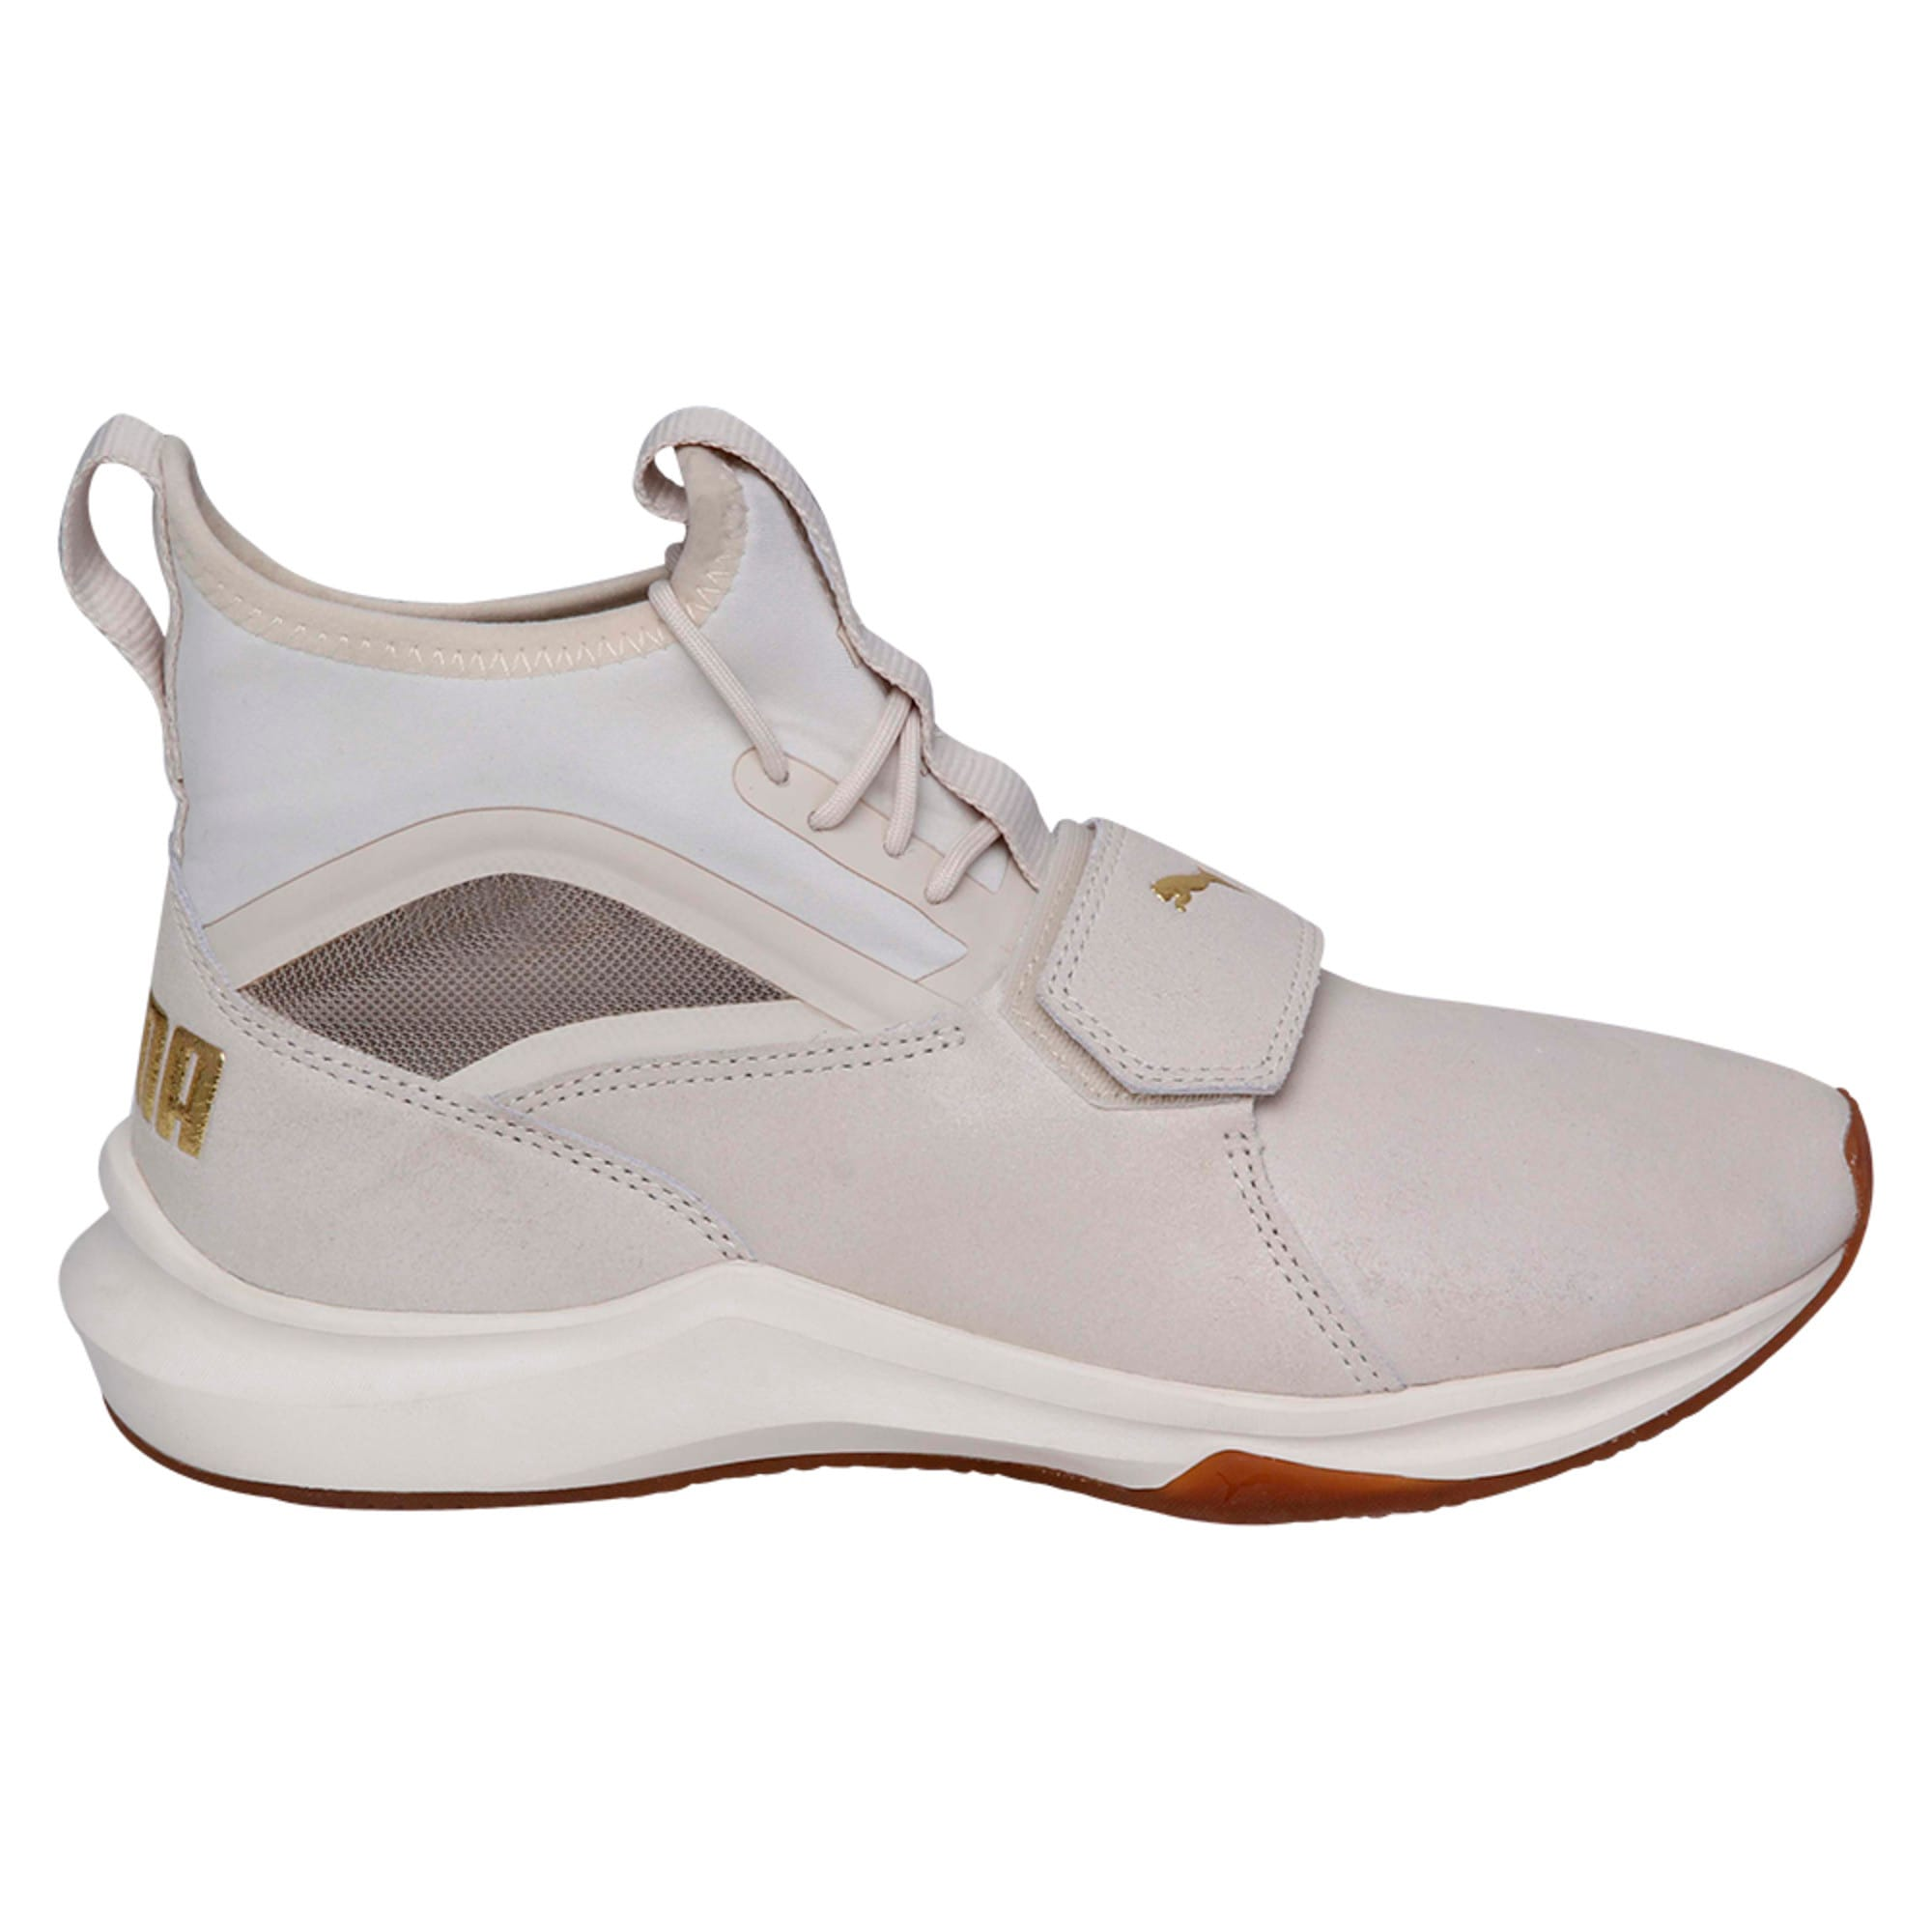 Thumbnail 5 of Phenom Shimmer Women's Training Shoes, Birch-Whisper White, medium-IND